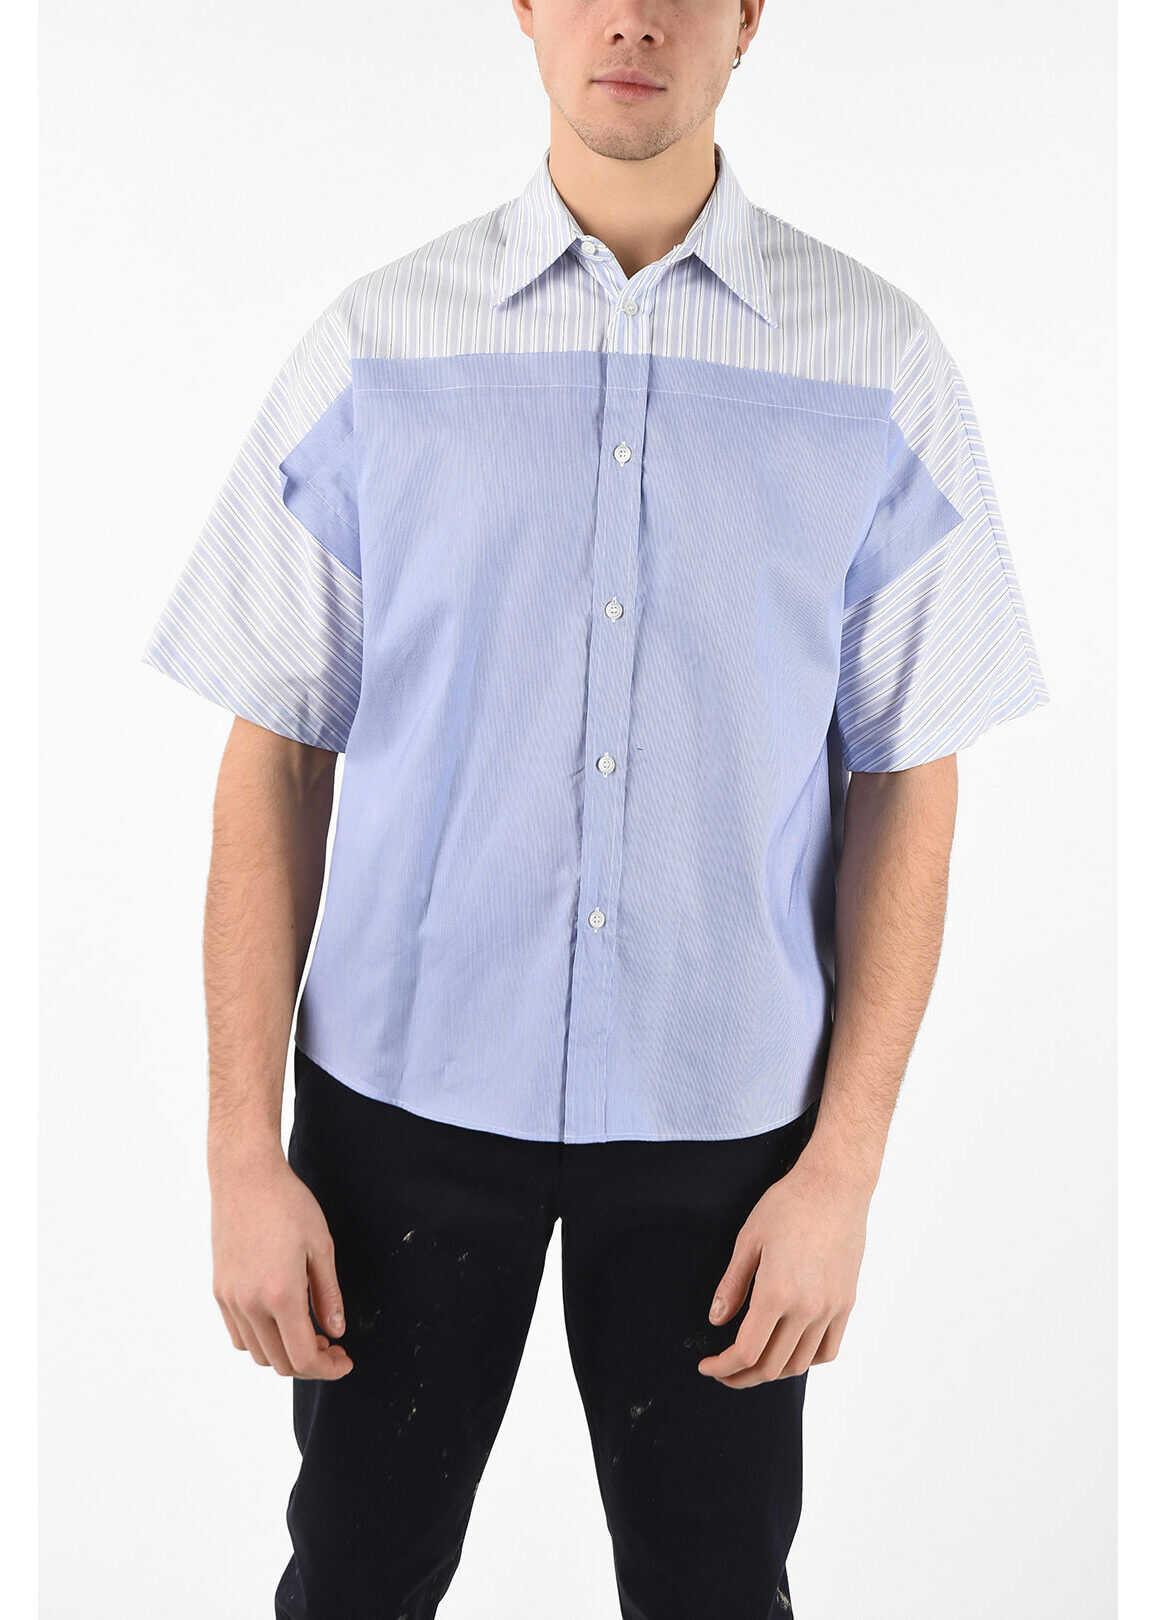 Maison Margiela MM10 Striped Shirt LIGHT BLUE imagine